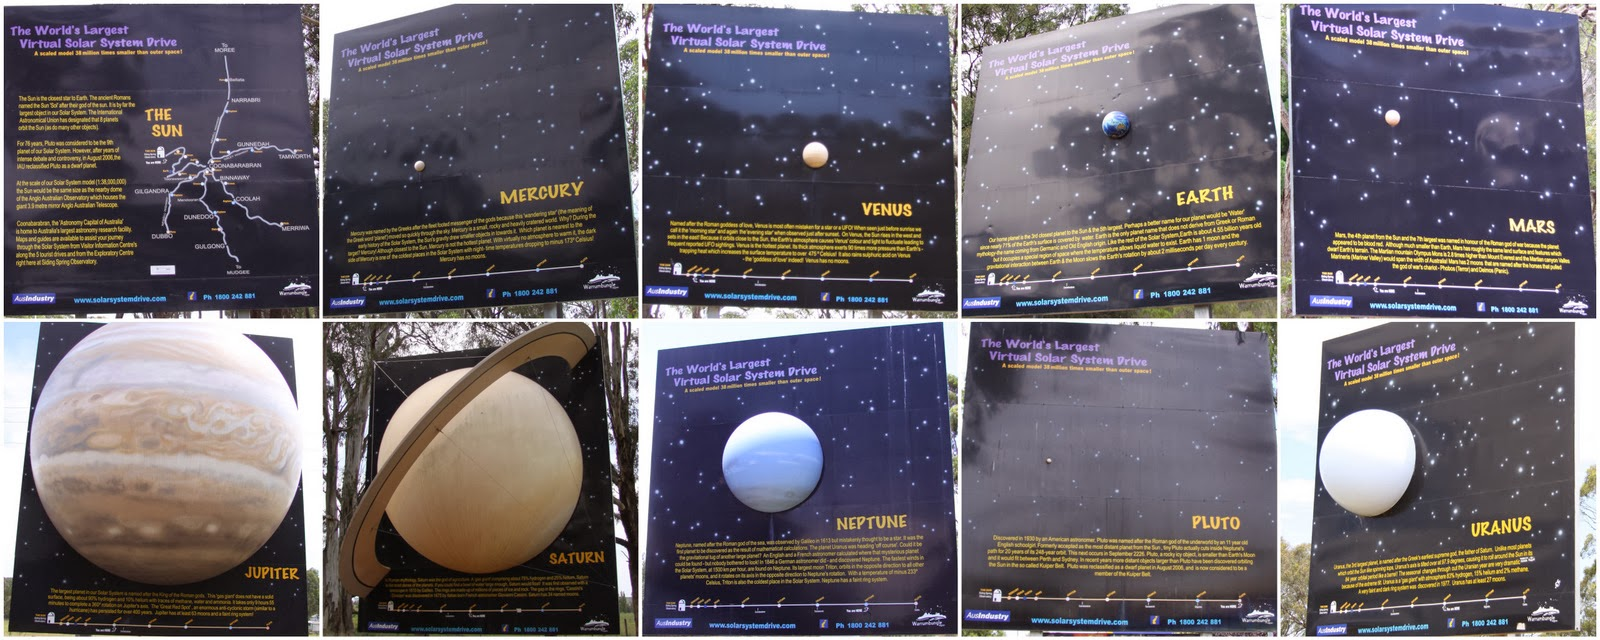 Sliding Springs Solar System Drive Planets